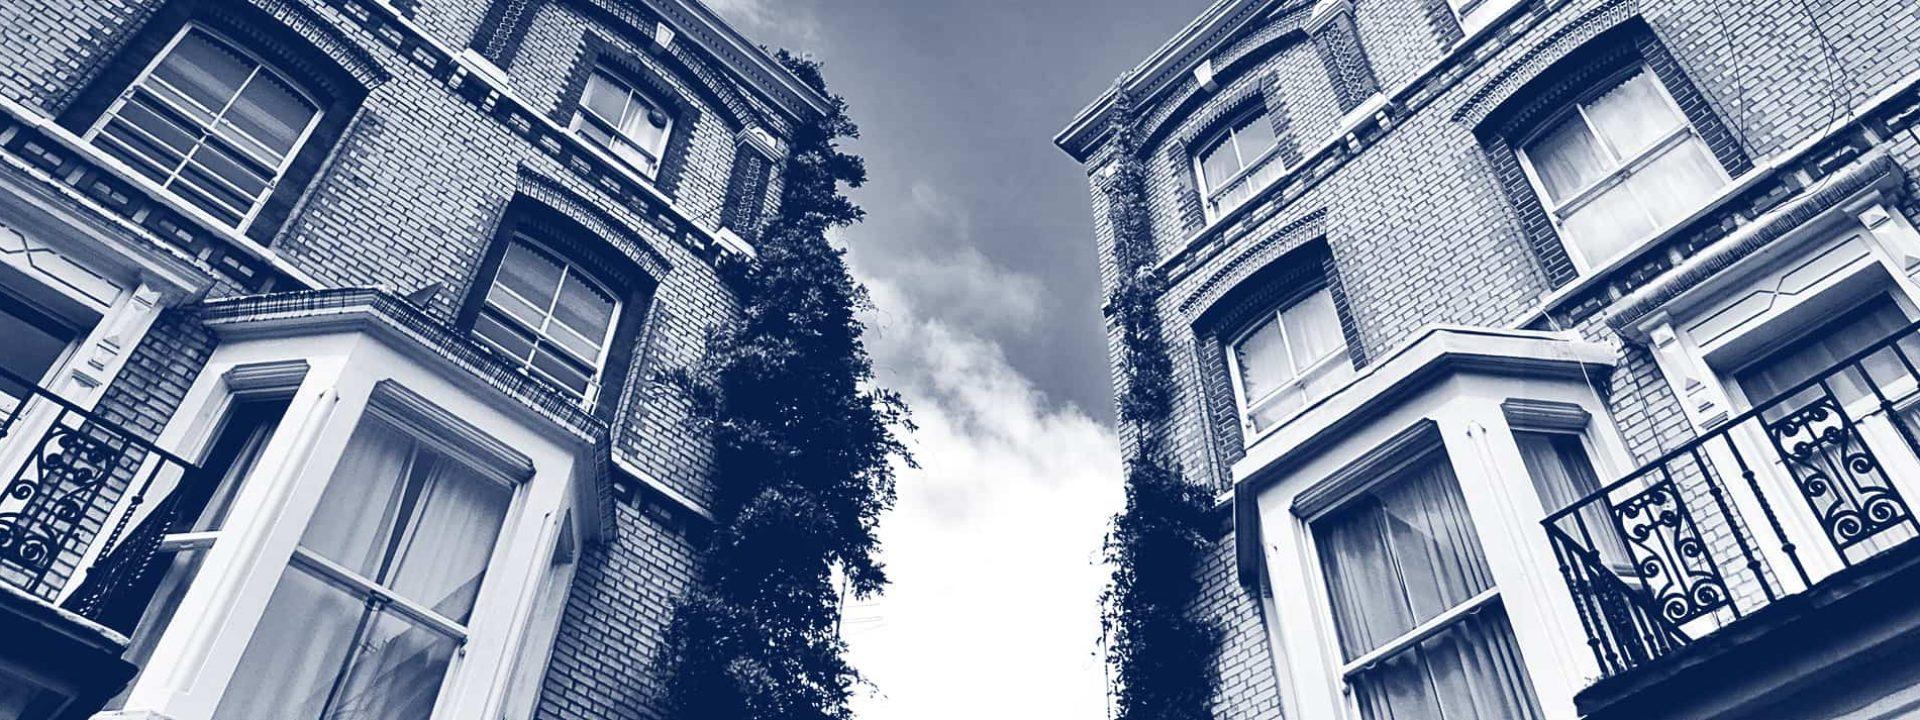 apartments-architecture-art-443379_wide-min